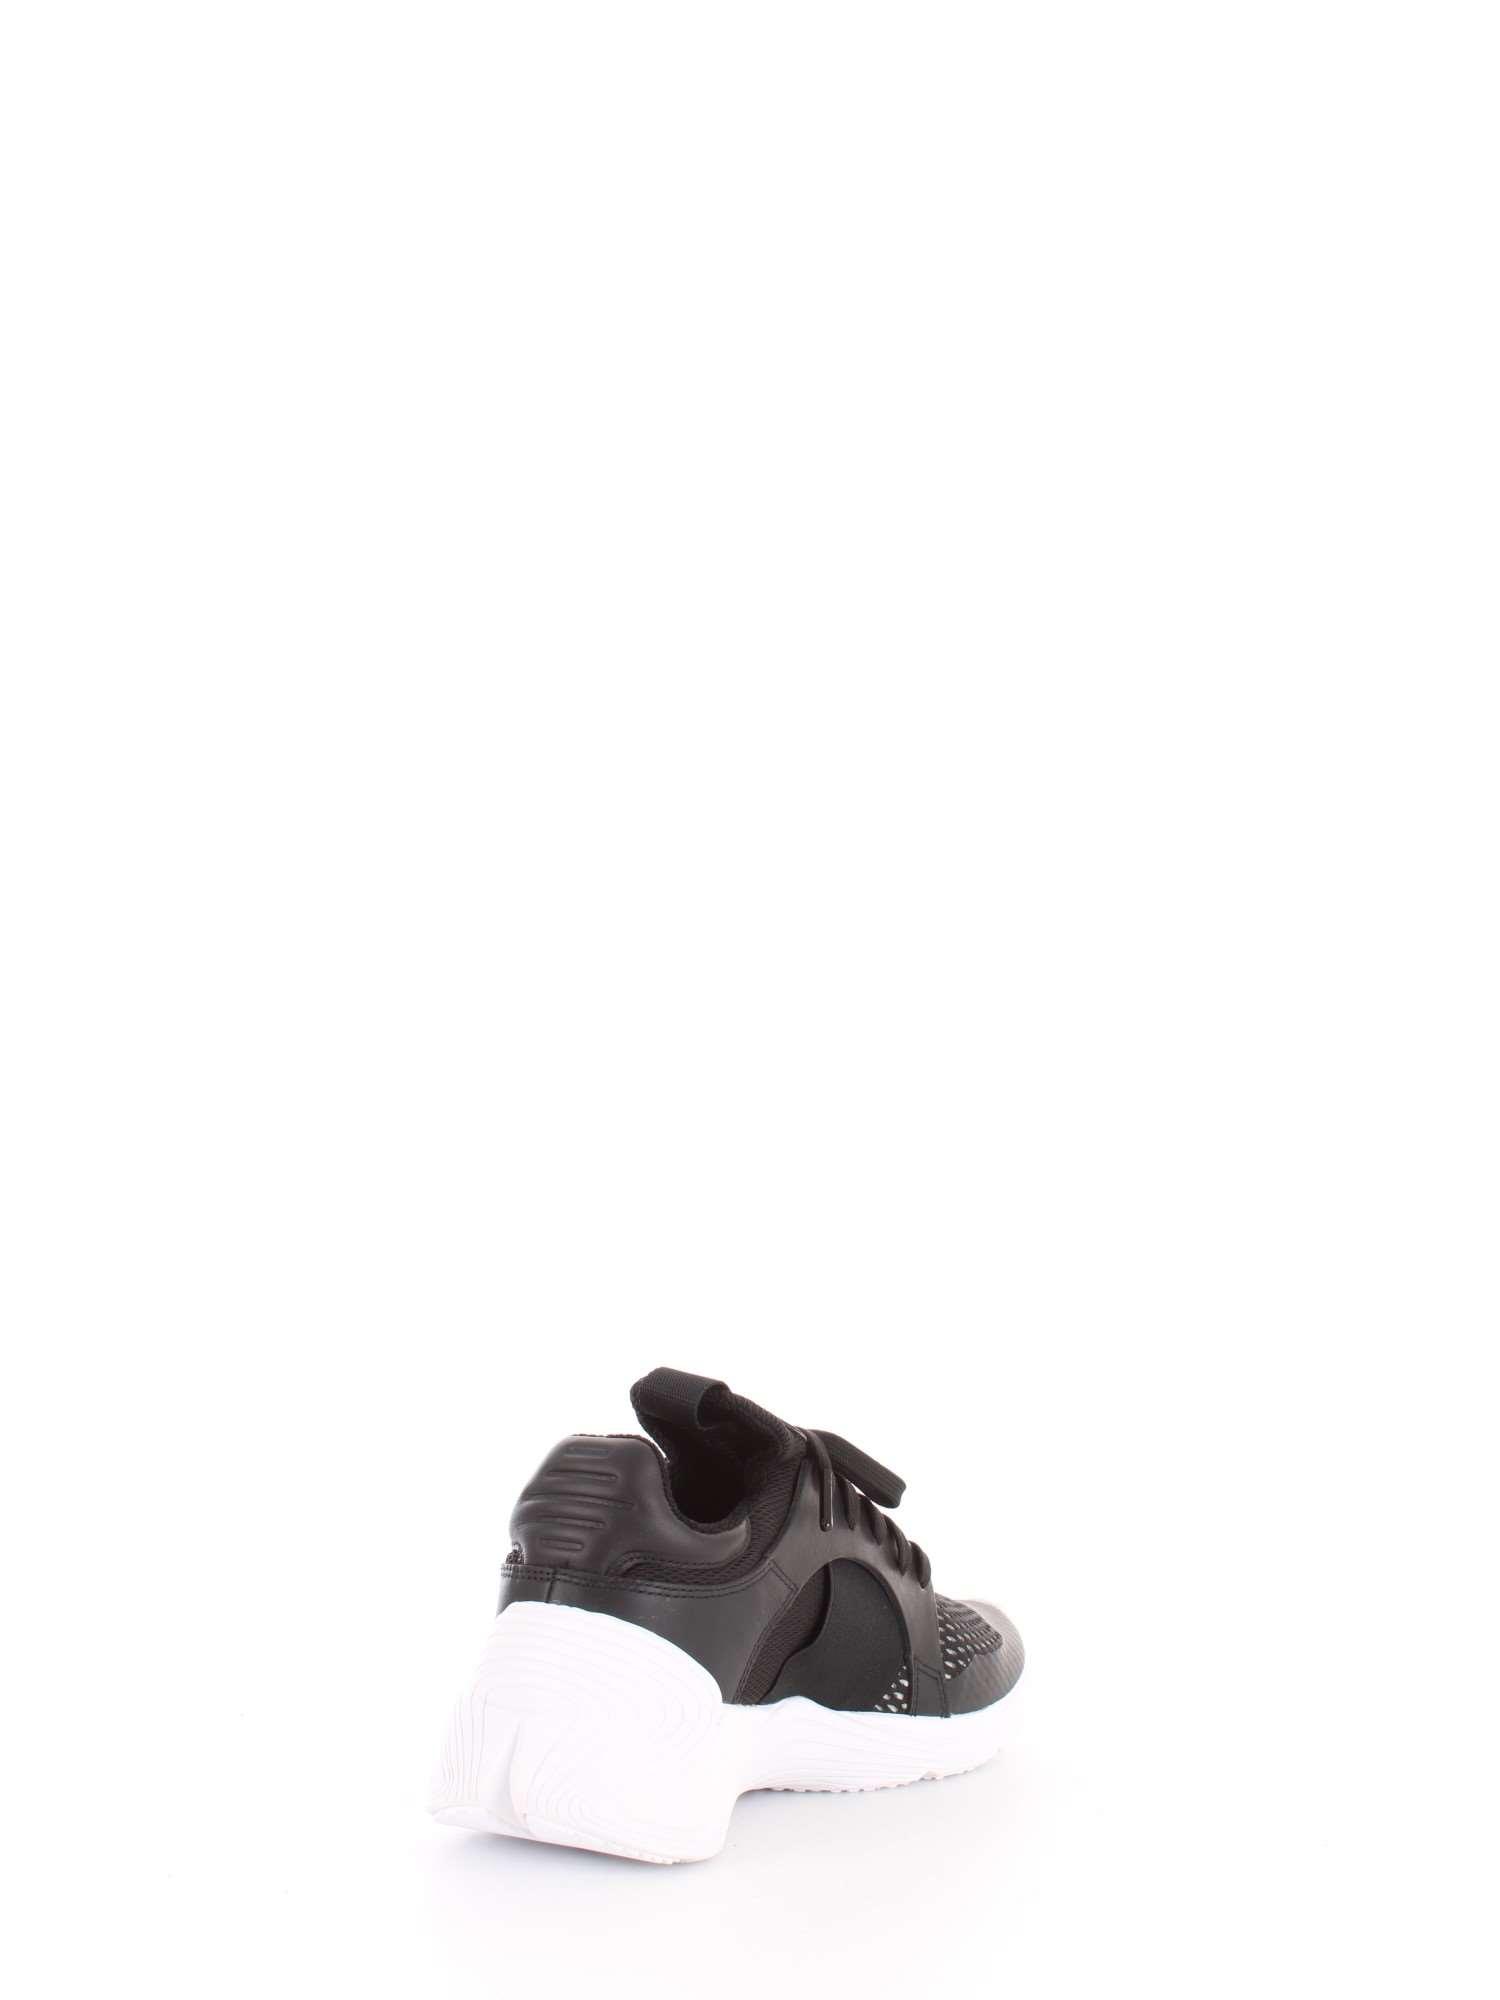 Printemps R2561 1006 Mcq 544904 été Sneakers Alexander Homme Mcqueen Noir 8ttq6Agw